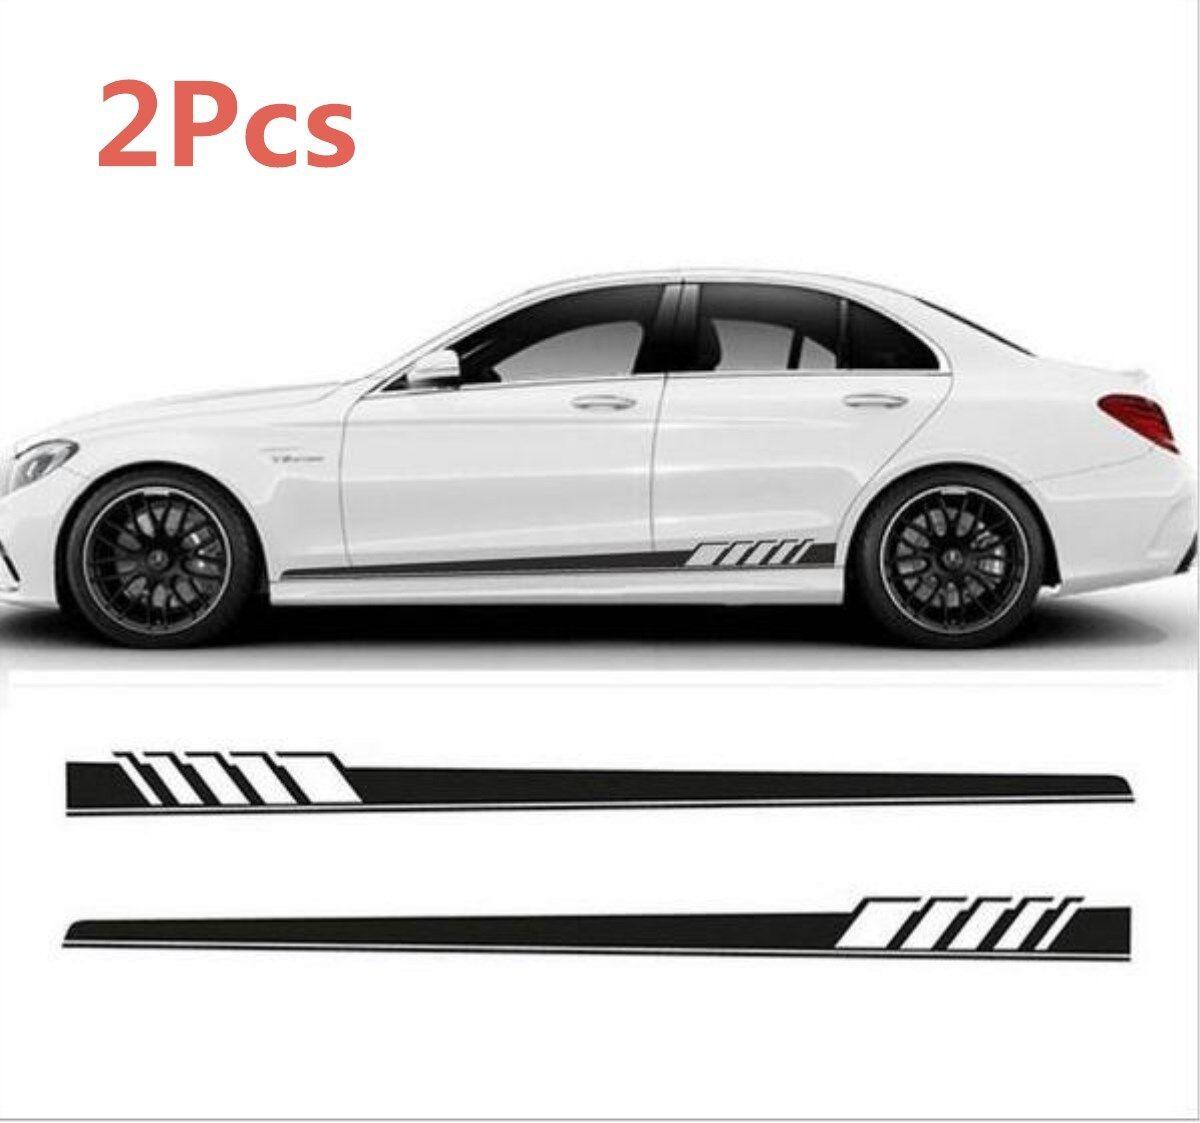 2pcs car side body vinyl decal sticker sports racing race car long stripe decals 2 2 of 5